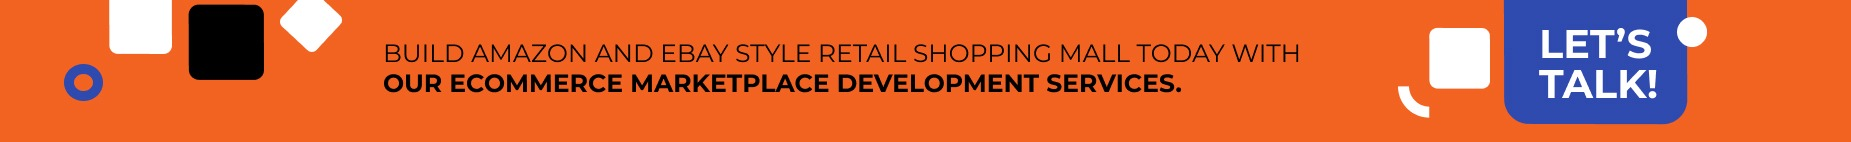 eCommerce marketplace development services.